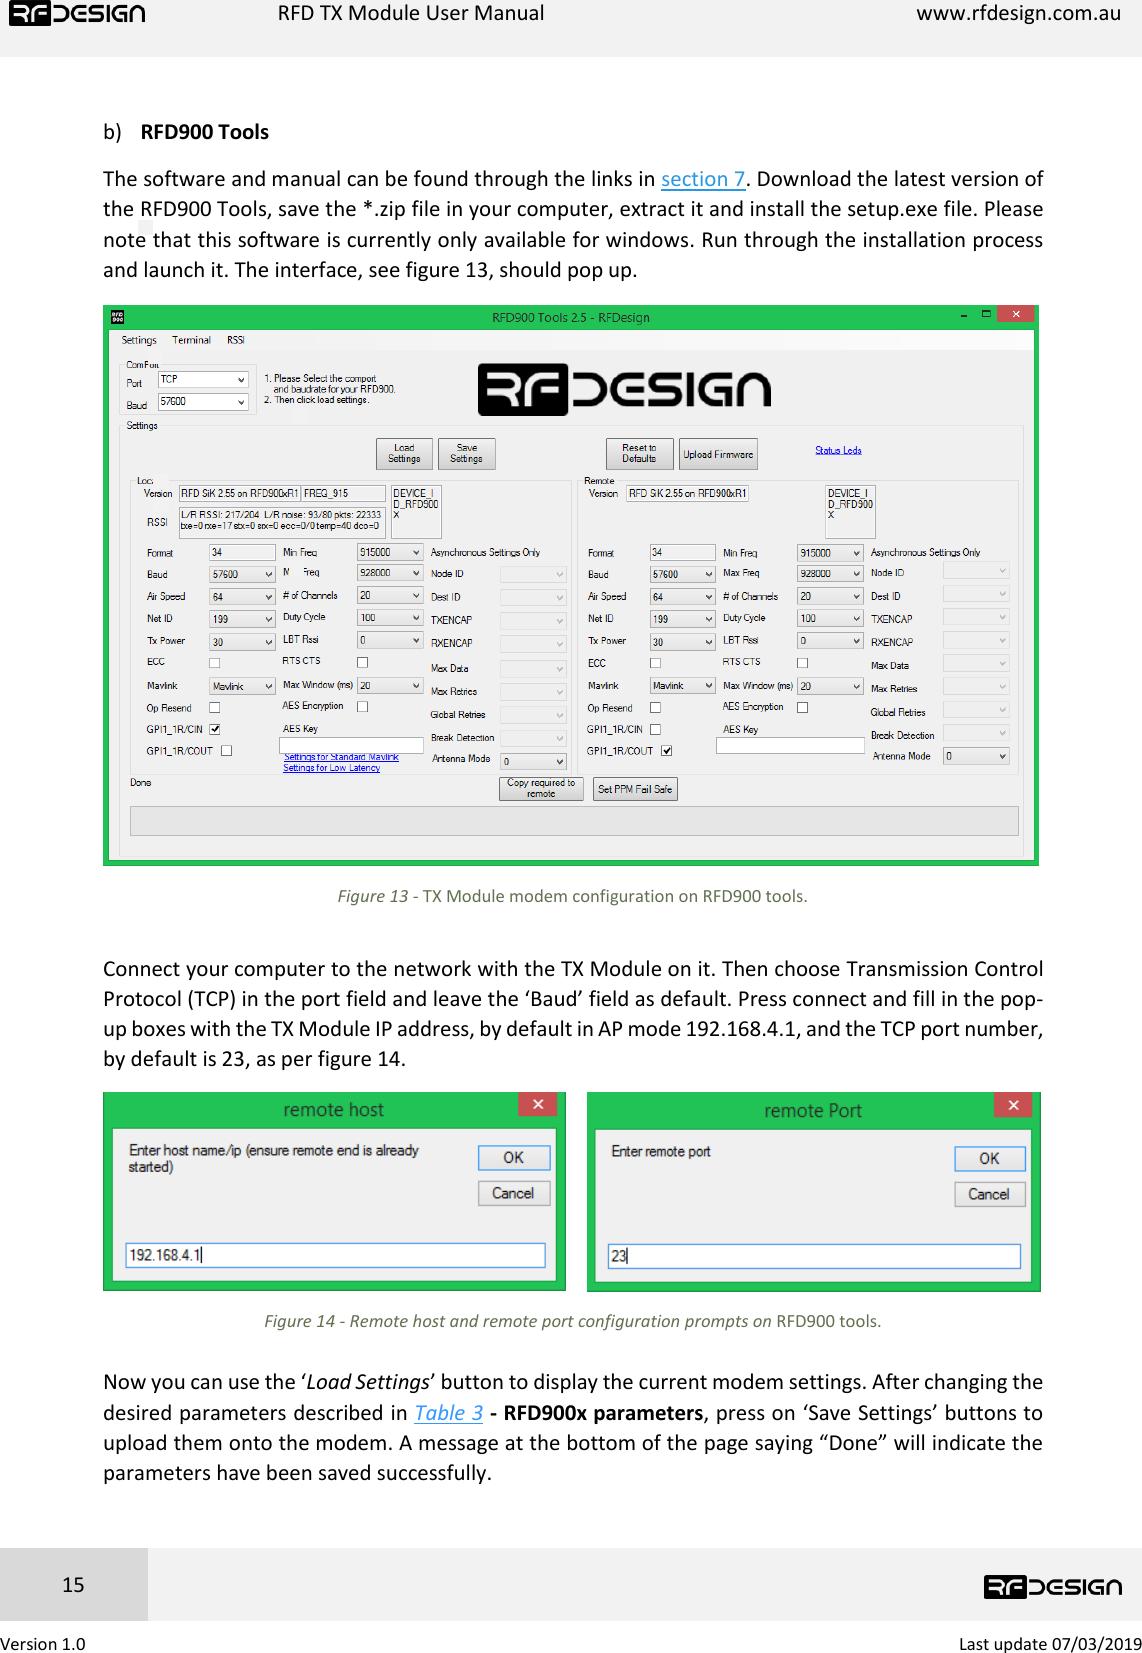 RFDesign RFD900x TX Module User Manual V1 0